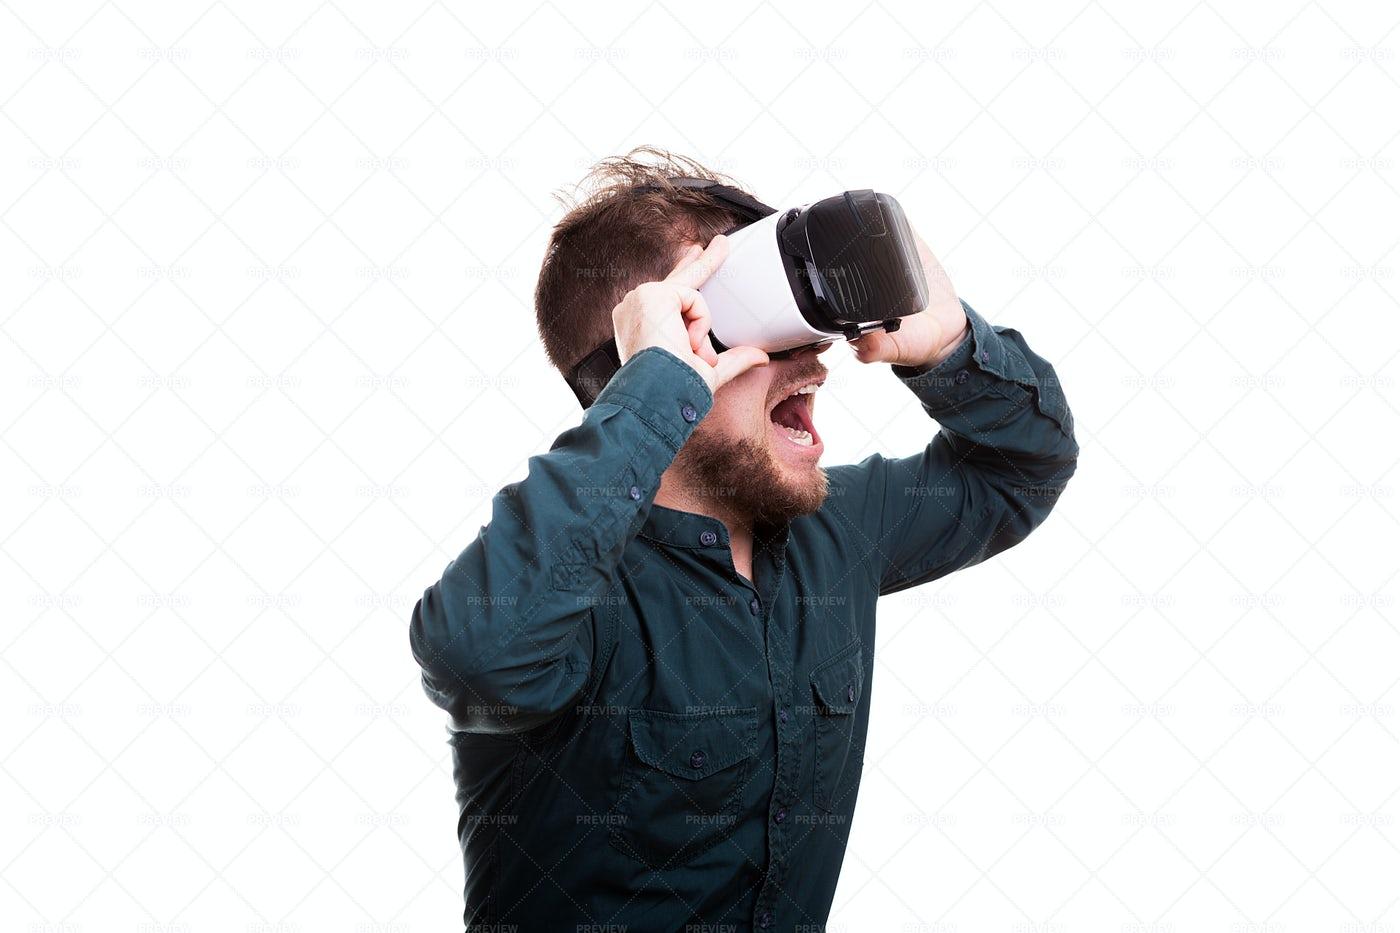 Experiencing Virtual Reality: Stock Photos